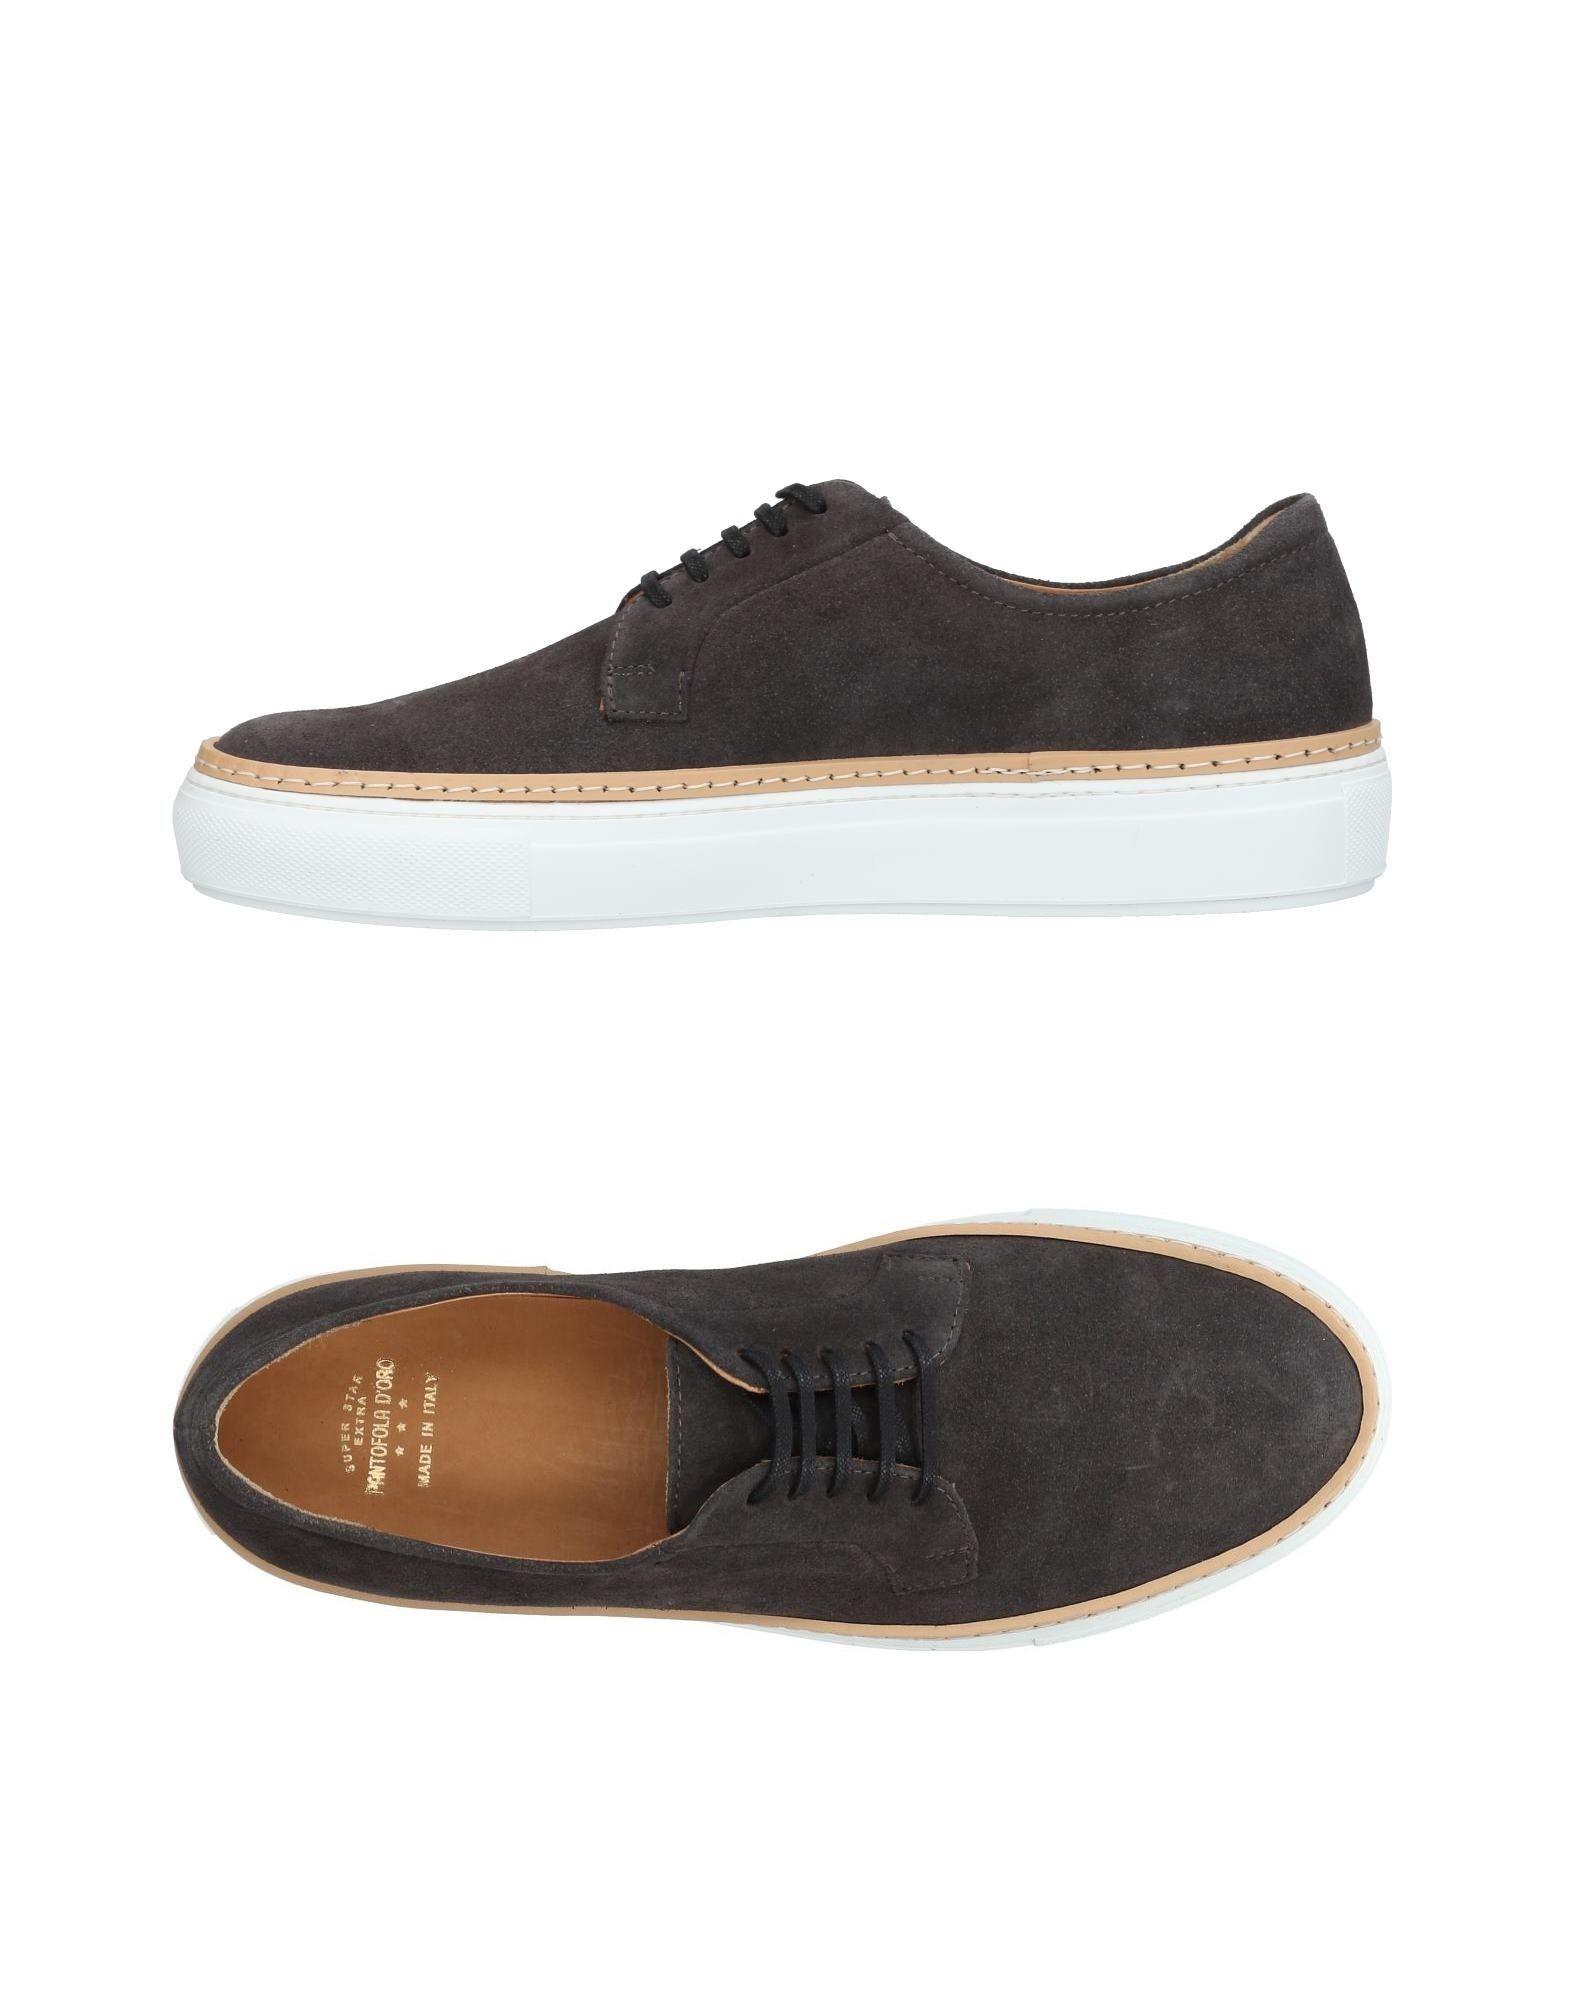 Pantofola D'oro Schnürschuhe Herren  11455568BL Neue Schuhe